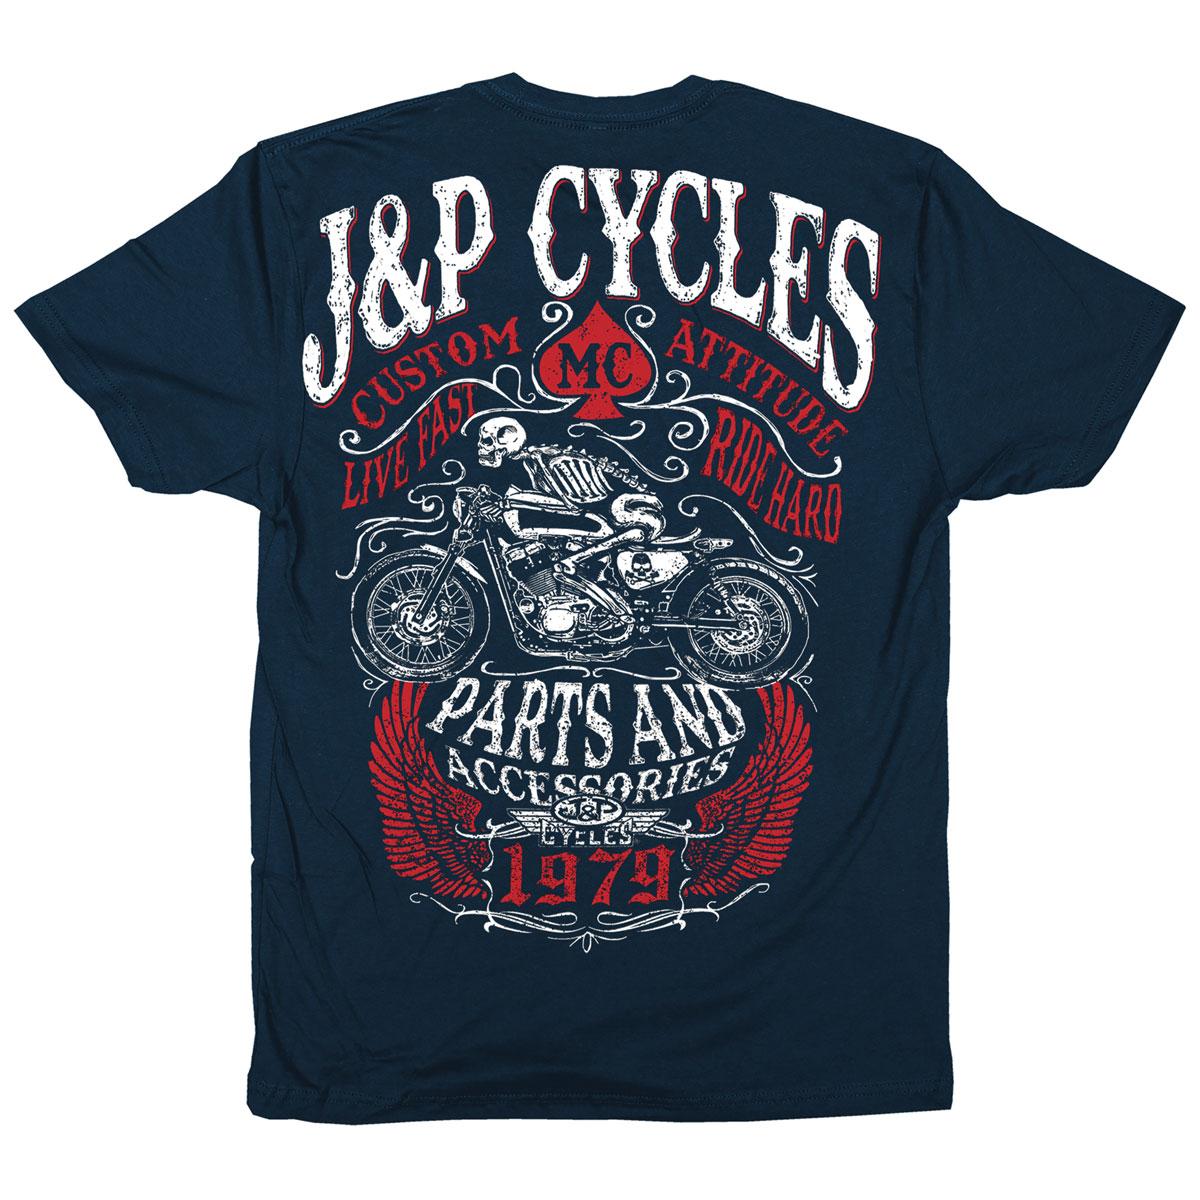 J&P Cycles Men's Death Rider Navy T-Shirt